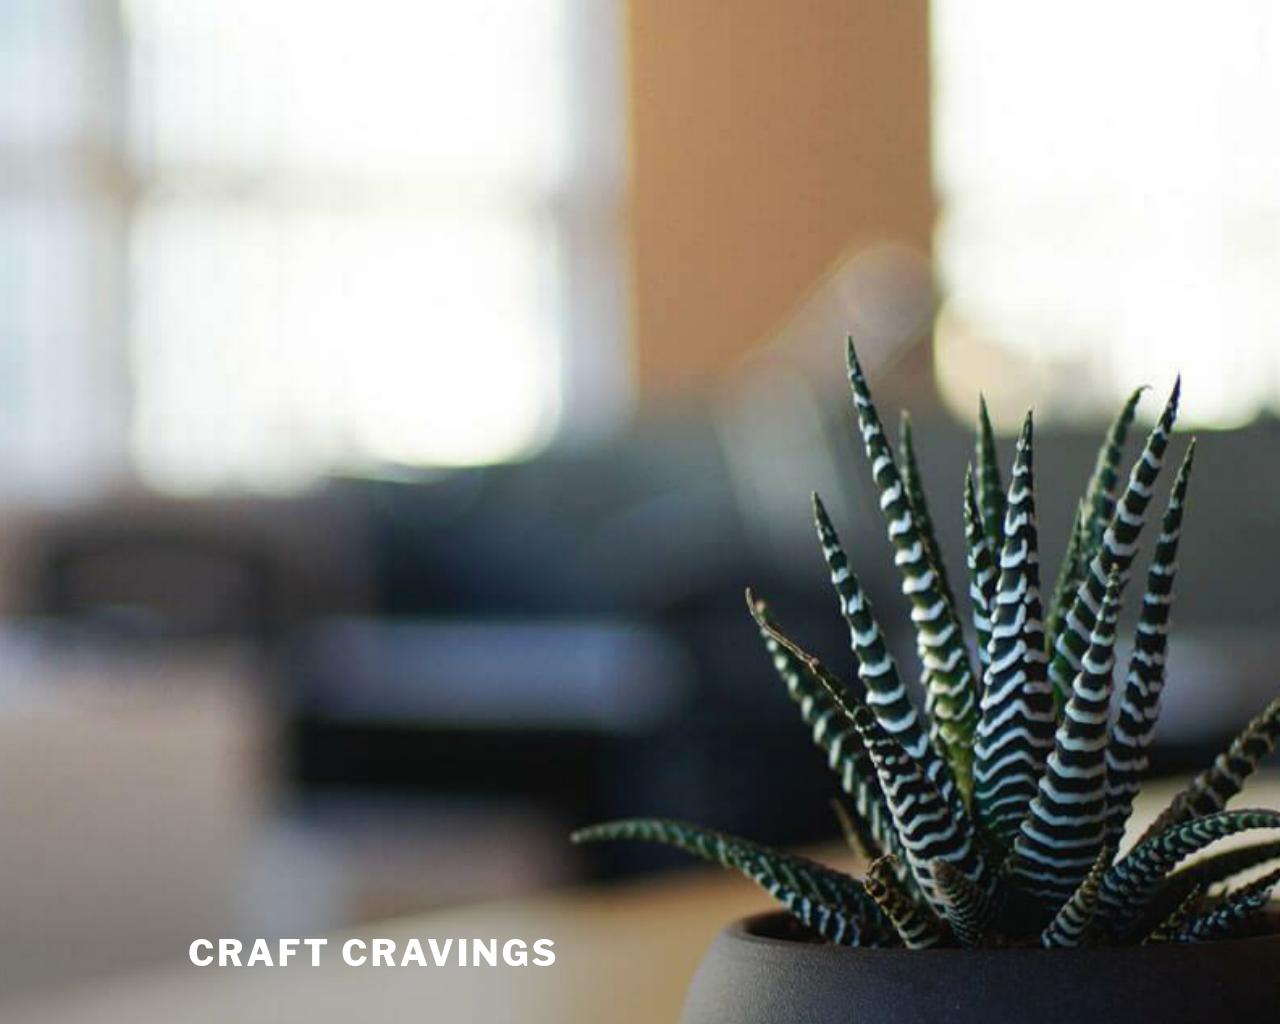 Craft-Cravings-Advertising-Reviews-Pricing